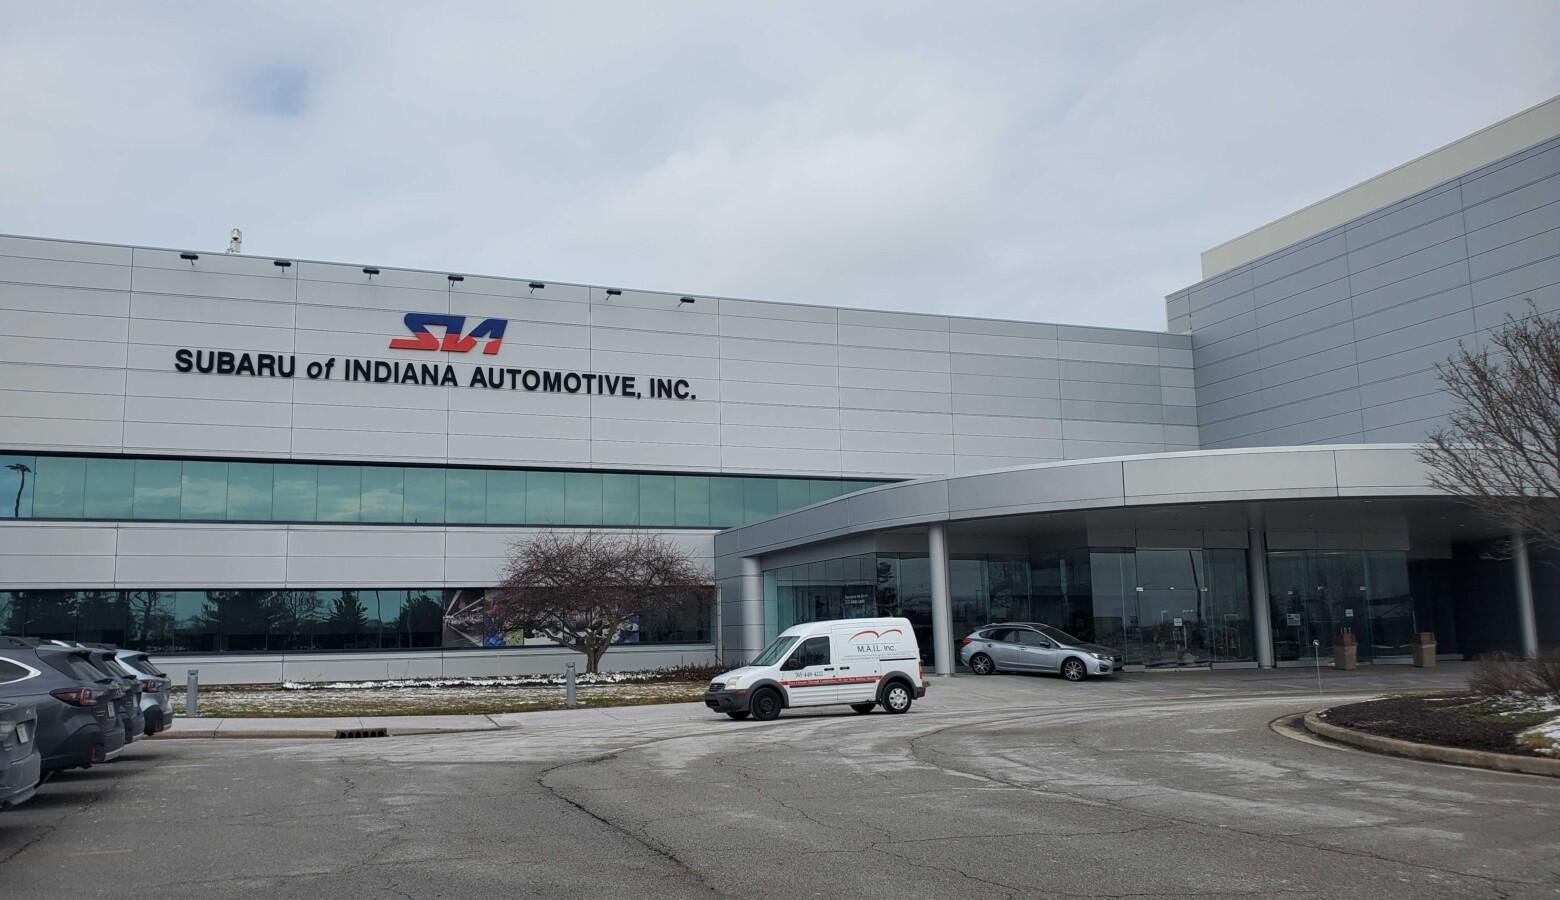 Subaru of Indiana Automotive facility in Lafayette's main entrance. (Samantha Horton/IPB News)